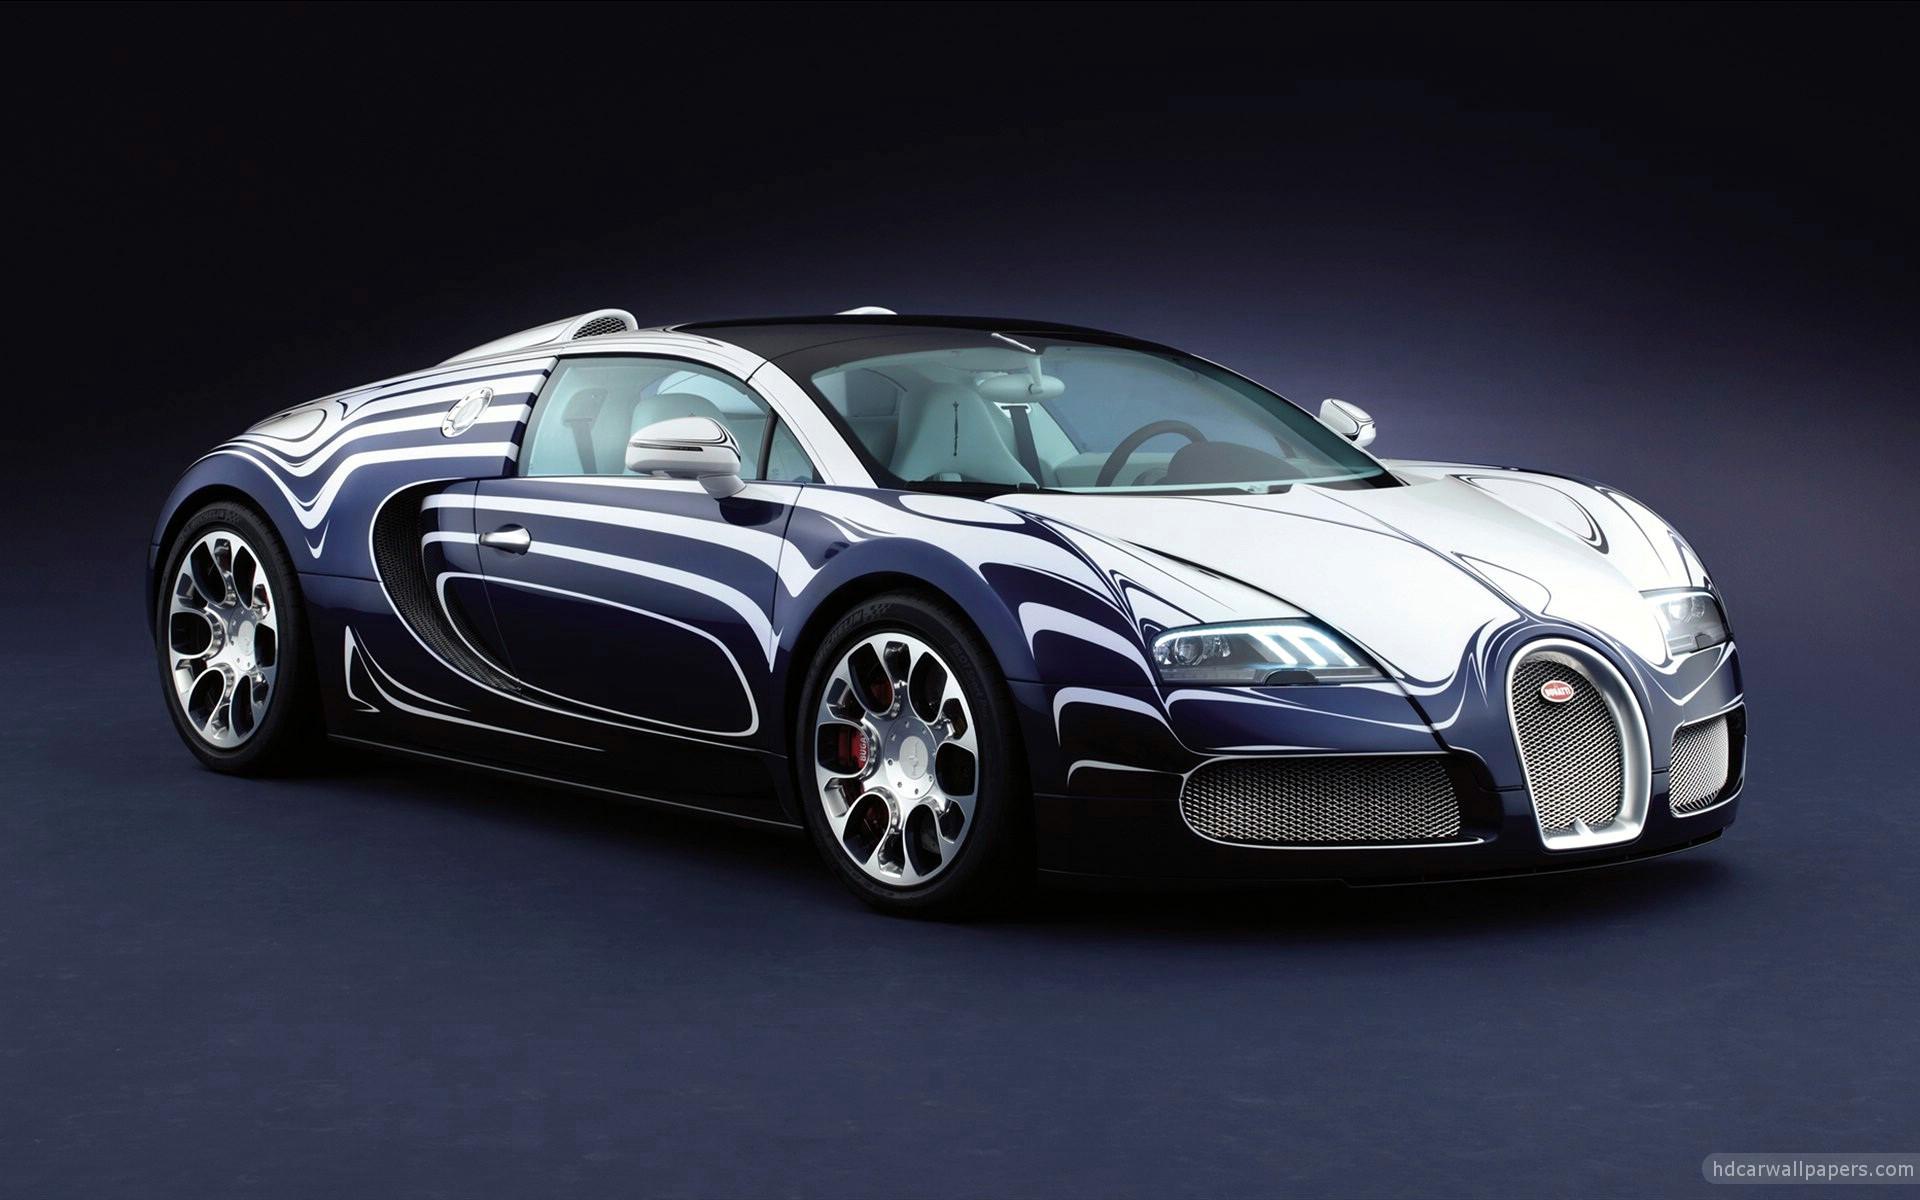 2011 Bugatti Veyron Grand Sport Wallpaper HD Car Wallpapers SmcLrKyu